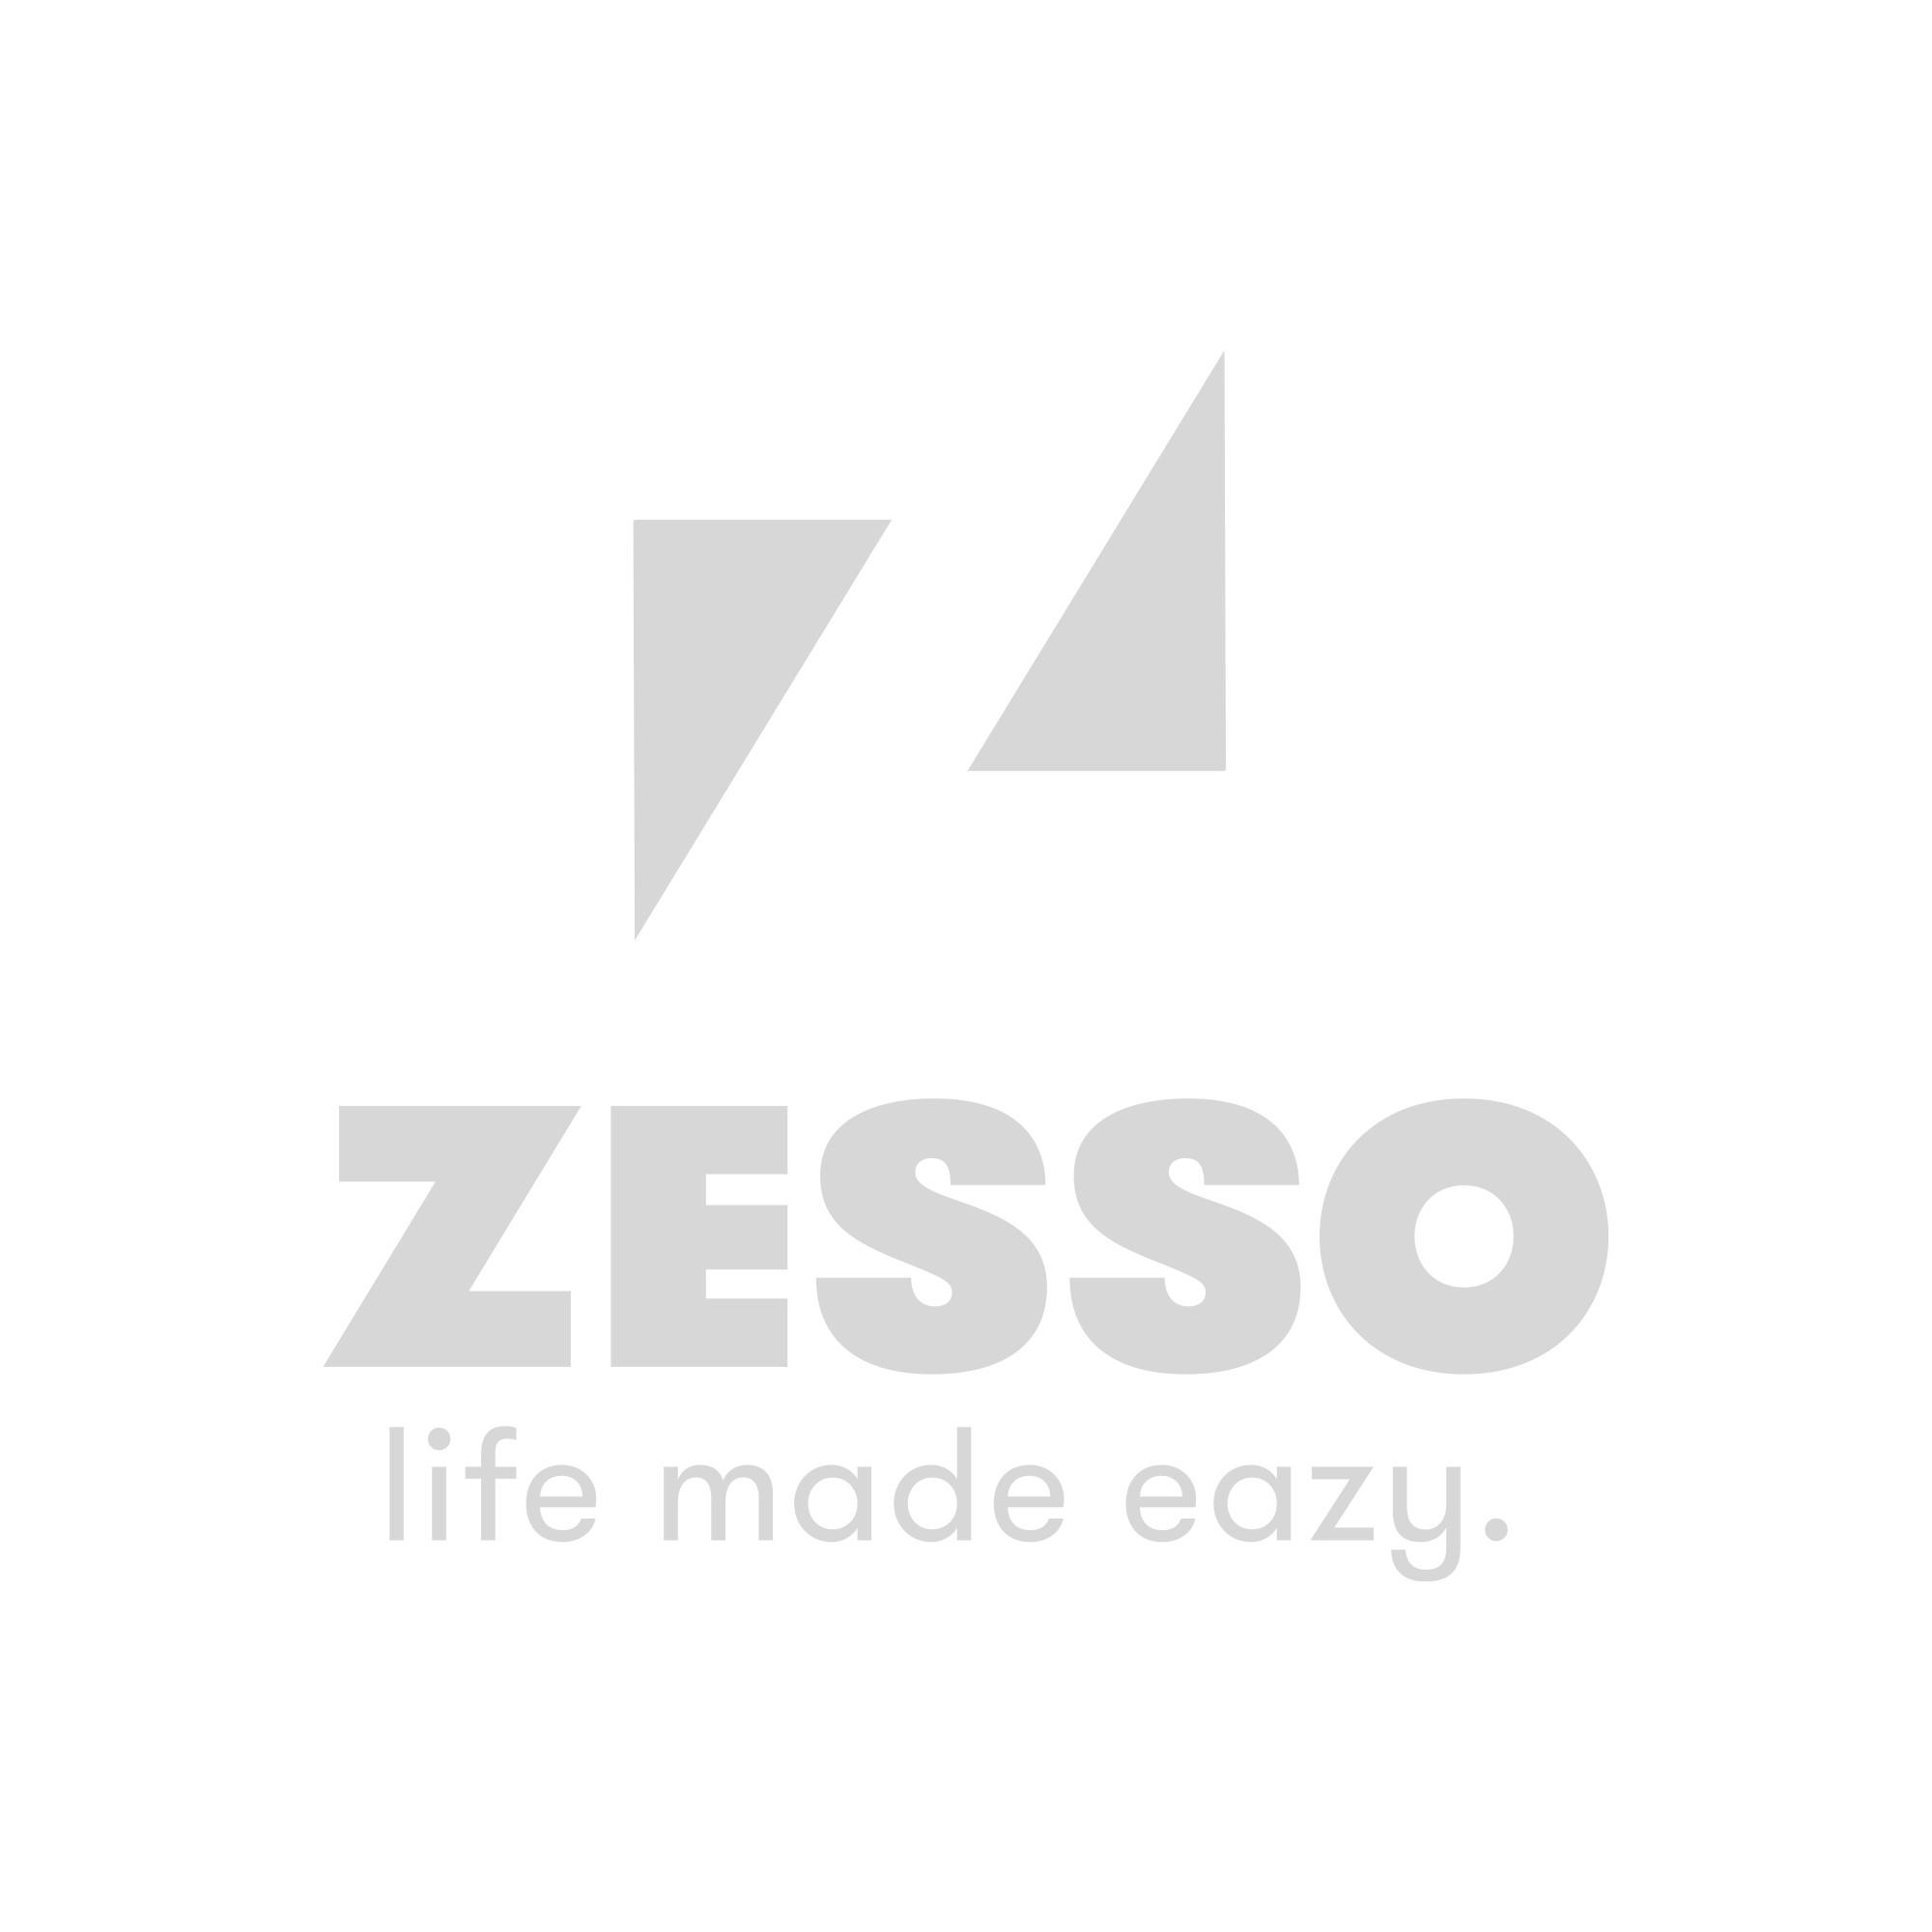 KidsDepot Vloerkleed Bear Wit 150 cm x 110 cm